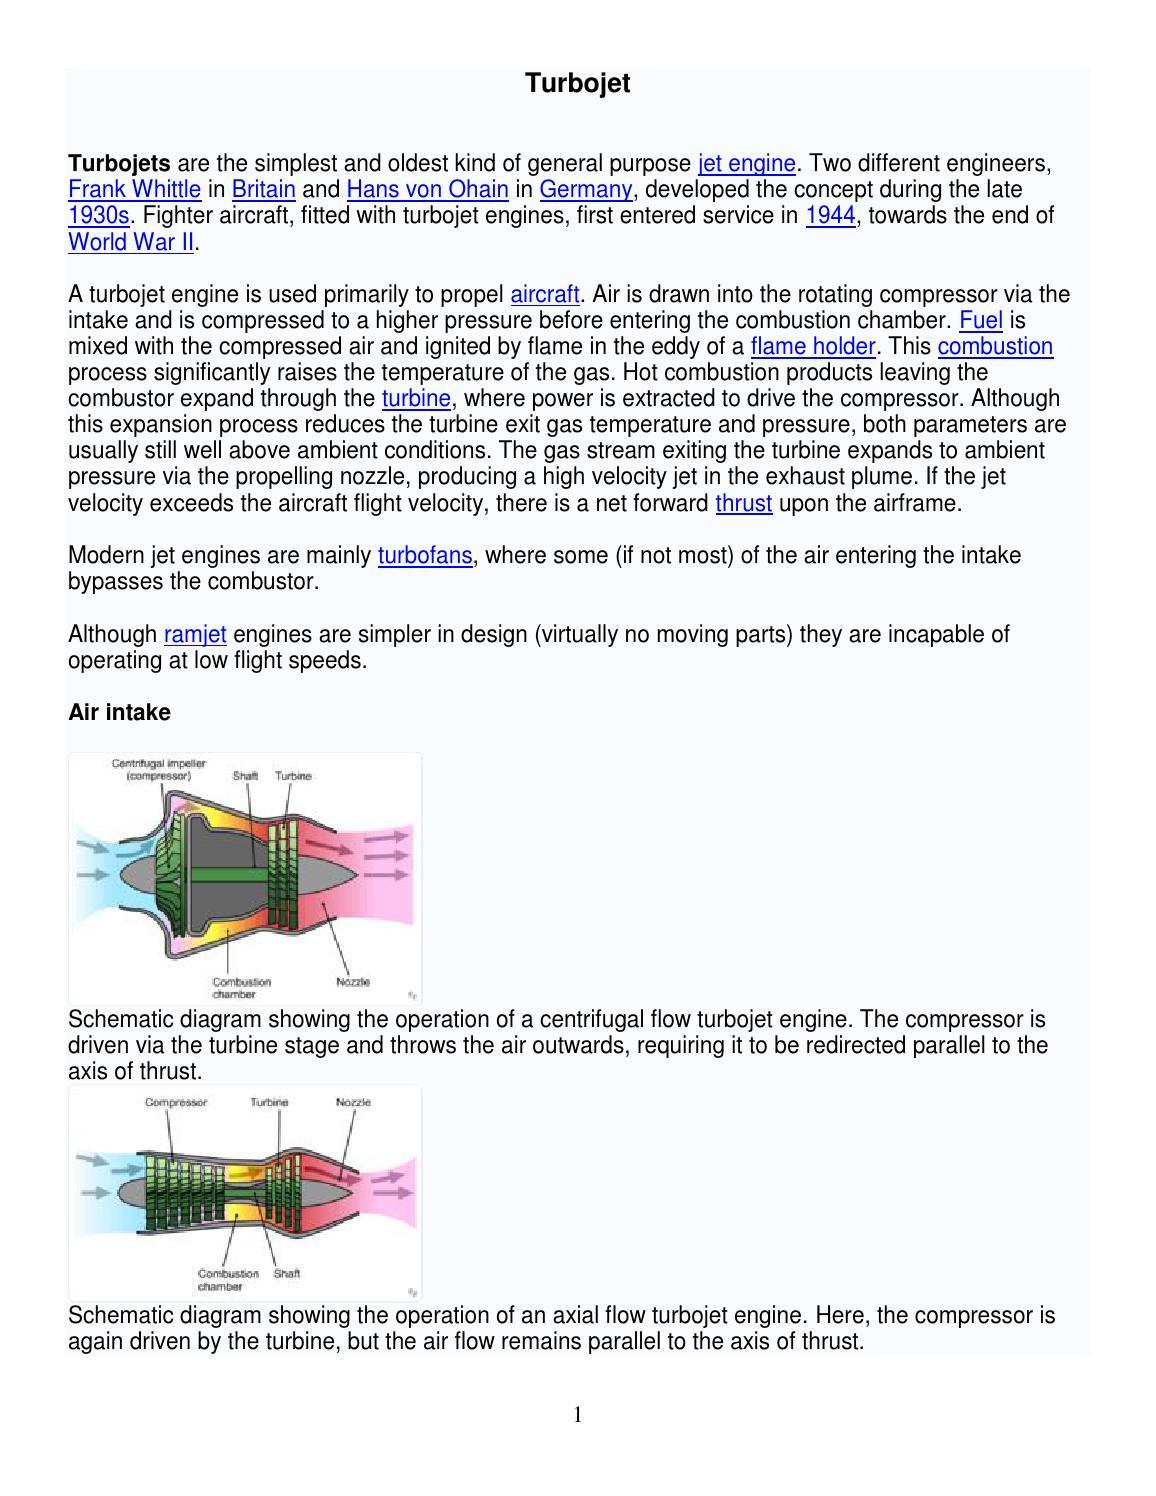 Schematic Diagram Of The Turbine Engine